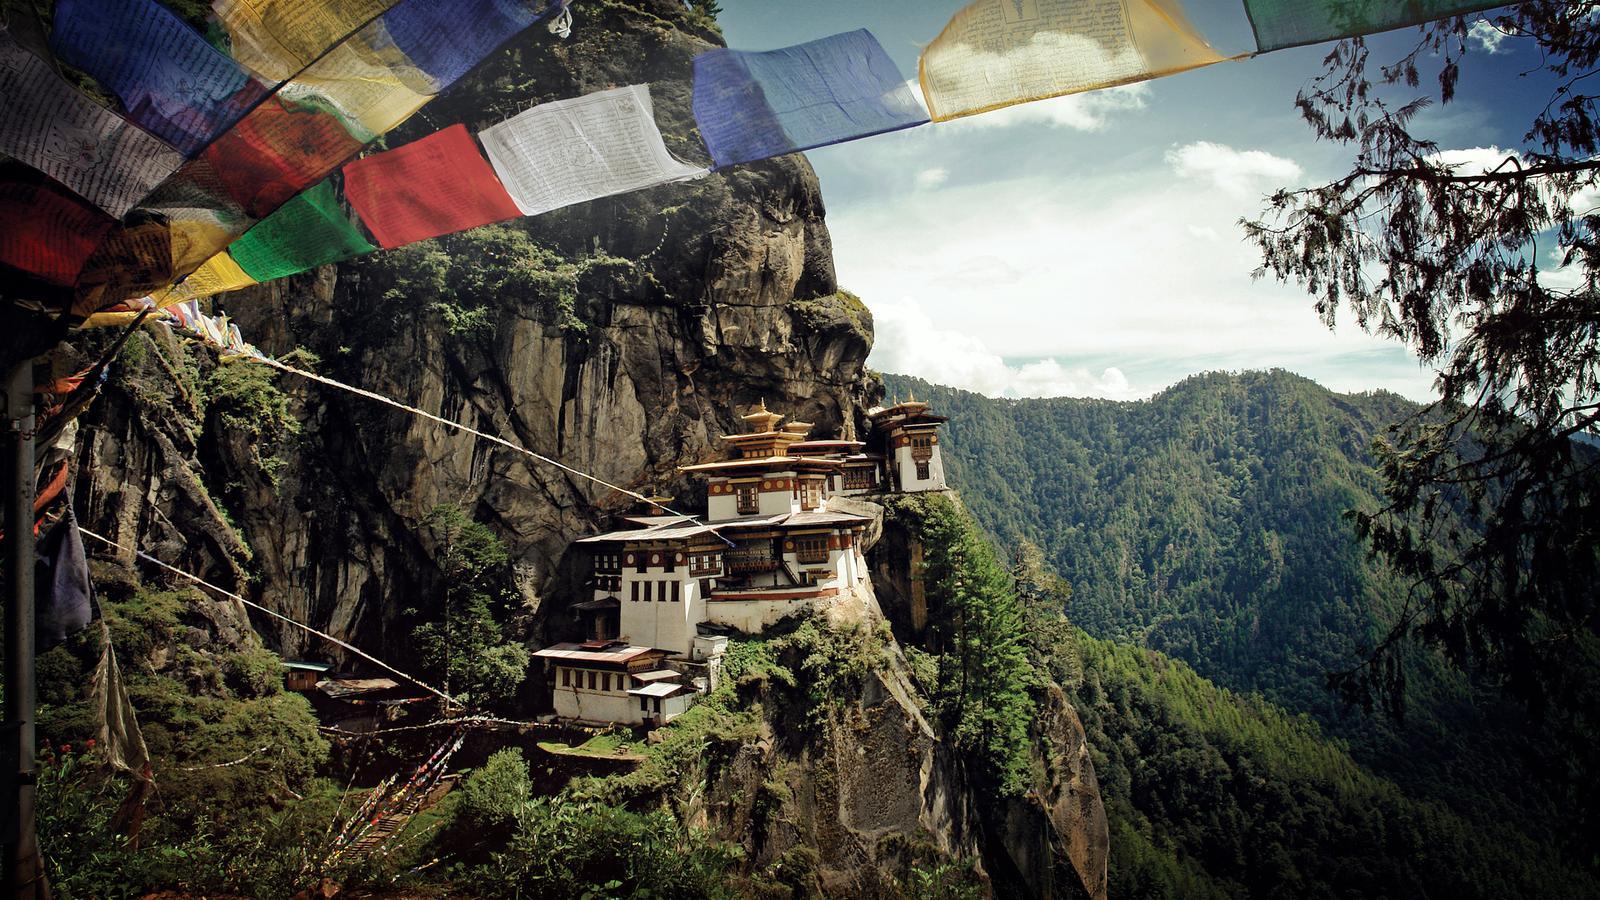 Taktshang-Kloster Tigernest Bhutan Trekking Urlaub Aktivreise traveljunkies